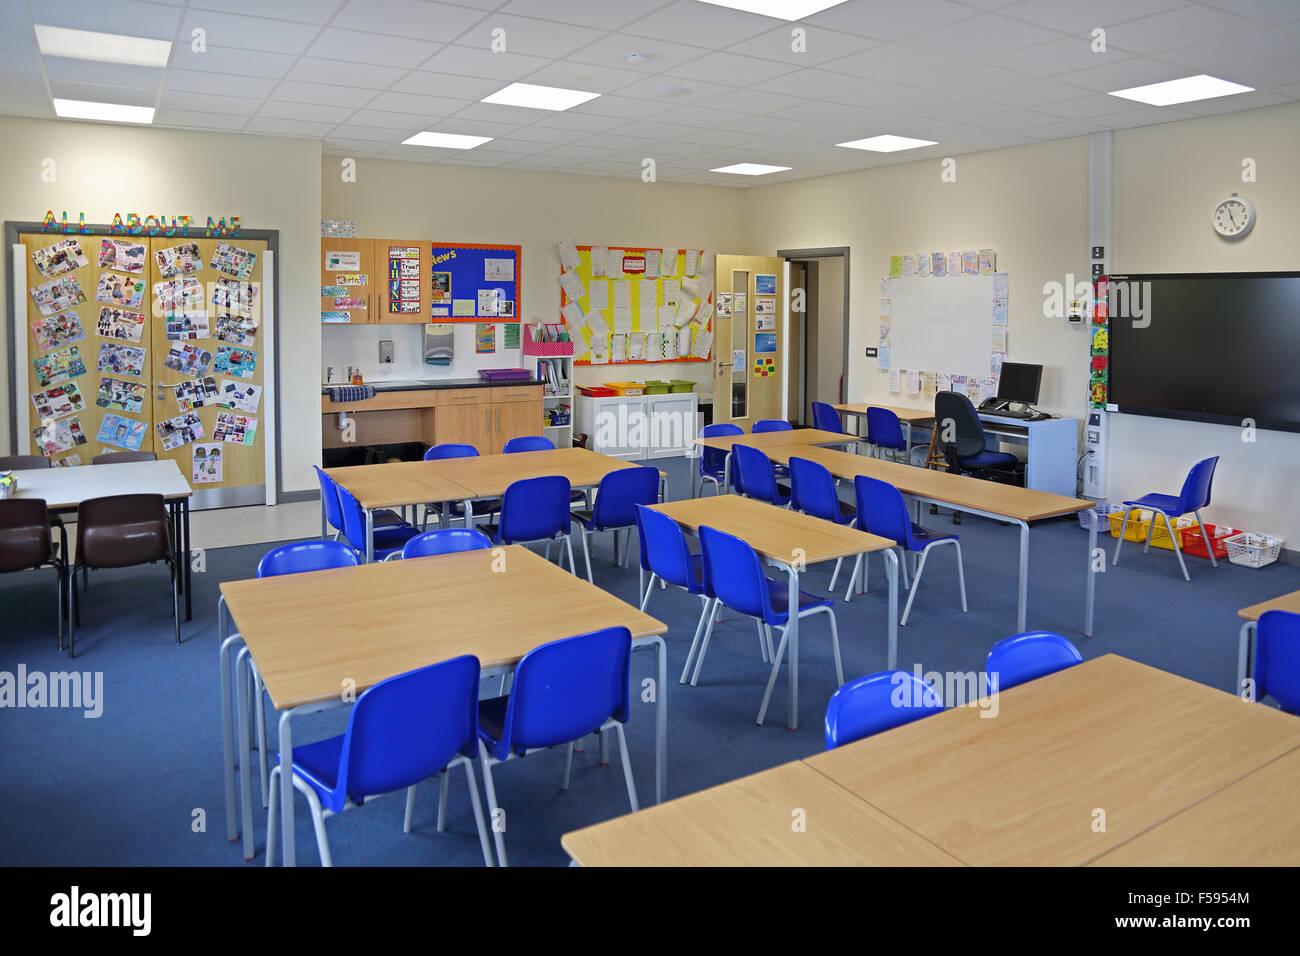 Classroom Design Uk : A classroom in newly built uk junior school shows desks